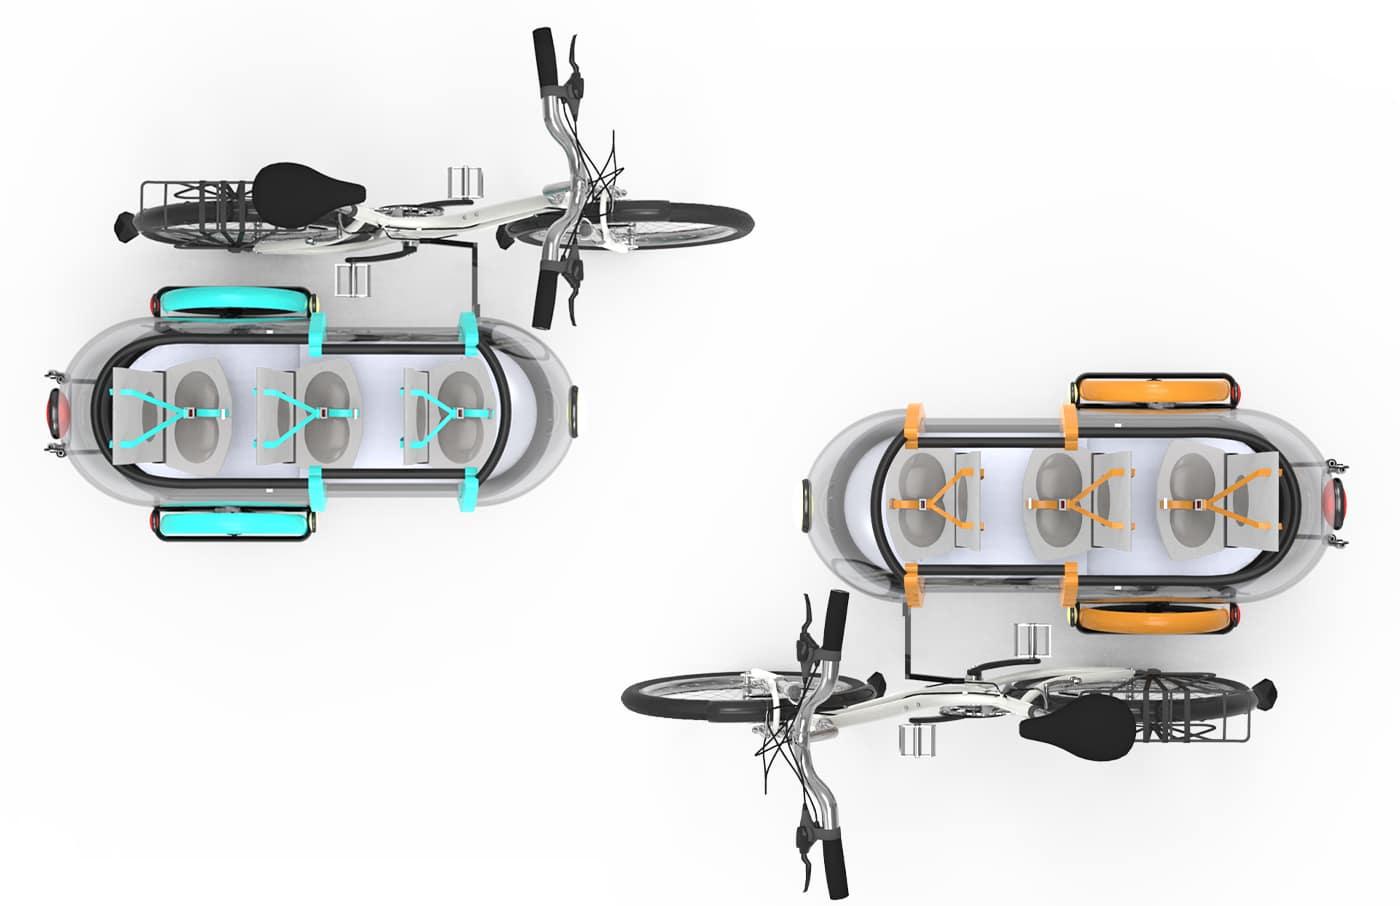 SideBuddy-by-Jordi-Hans-Design-Bycycle-Trailer,-Cargo-Bike,-Side-Trailer,-Kid-Bike-trailer,-by-Jonkoping-Sweden-Design-Consuting-2